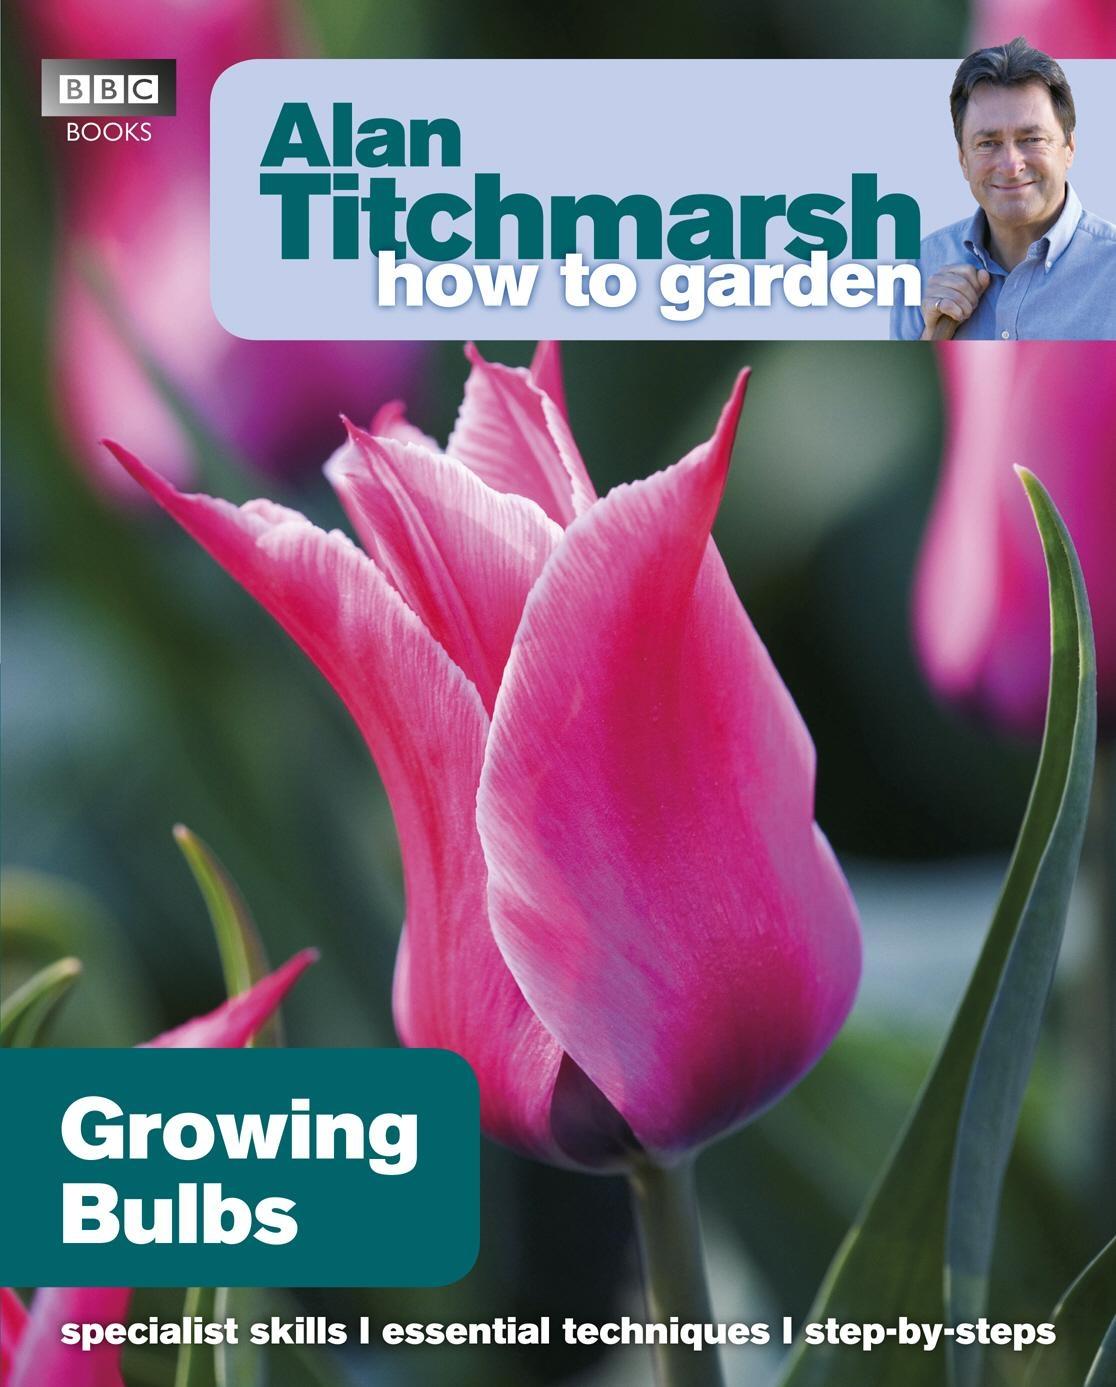 Alan Titchmarsh How to Garden Growing Bulbs by Alan Titchmarsh